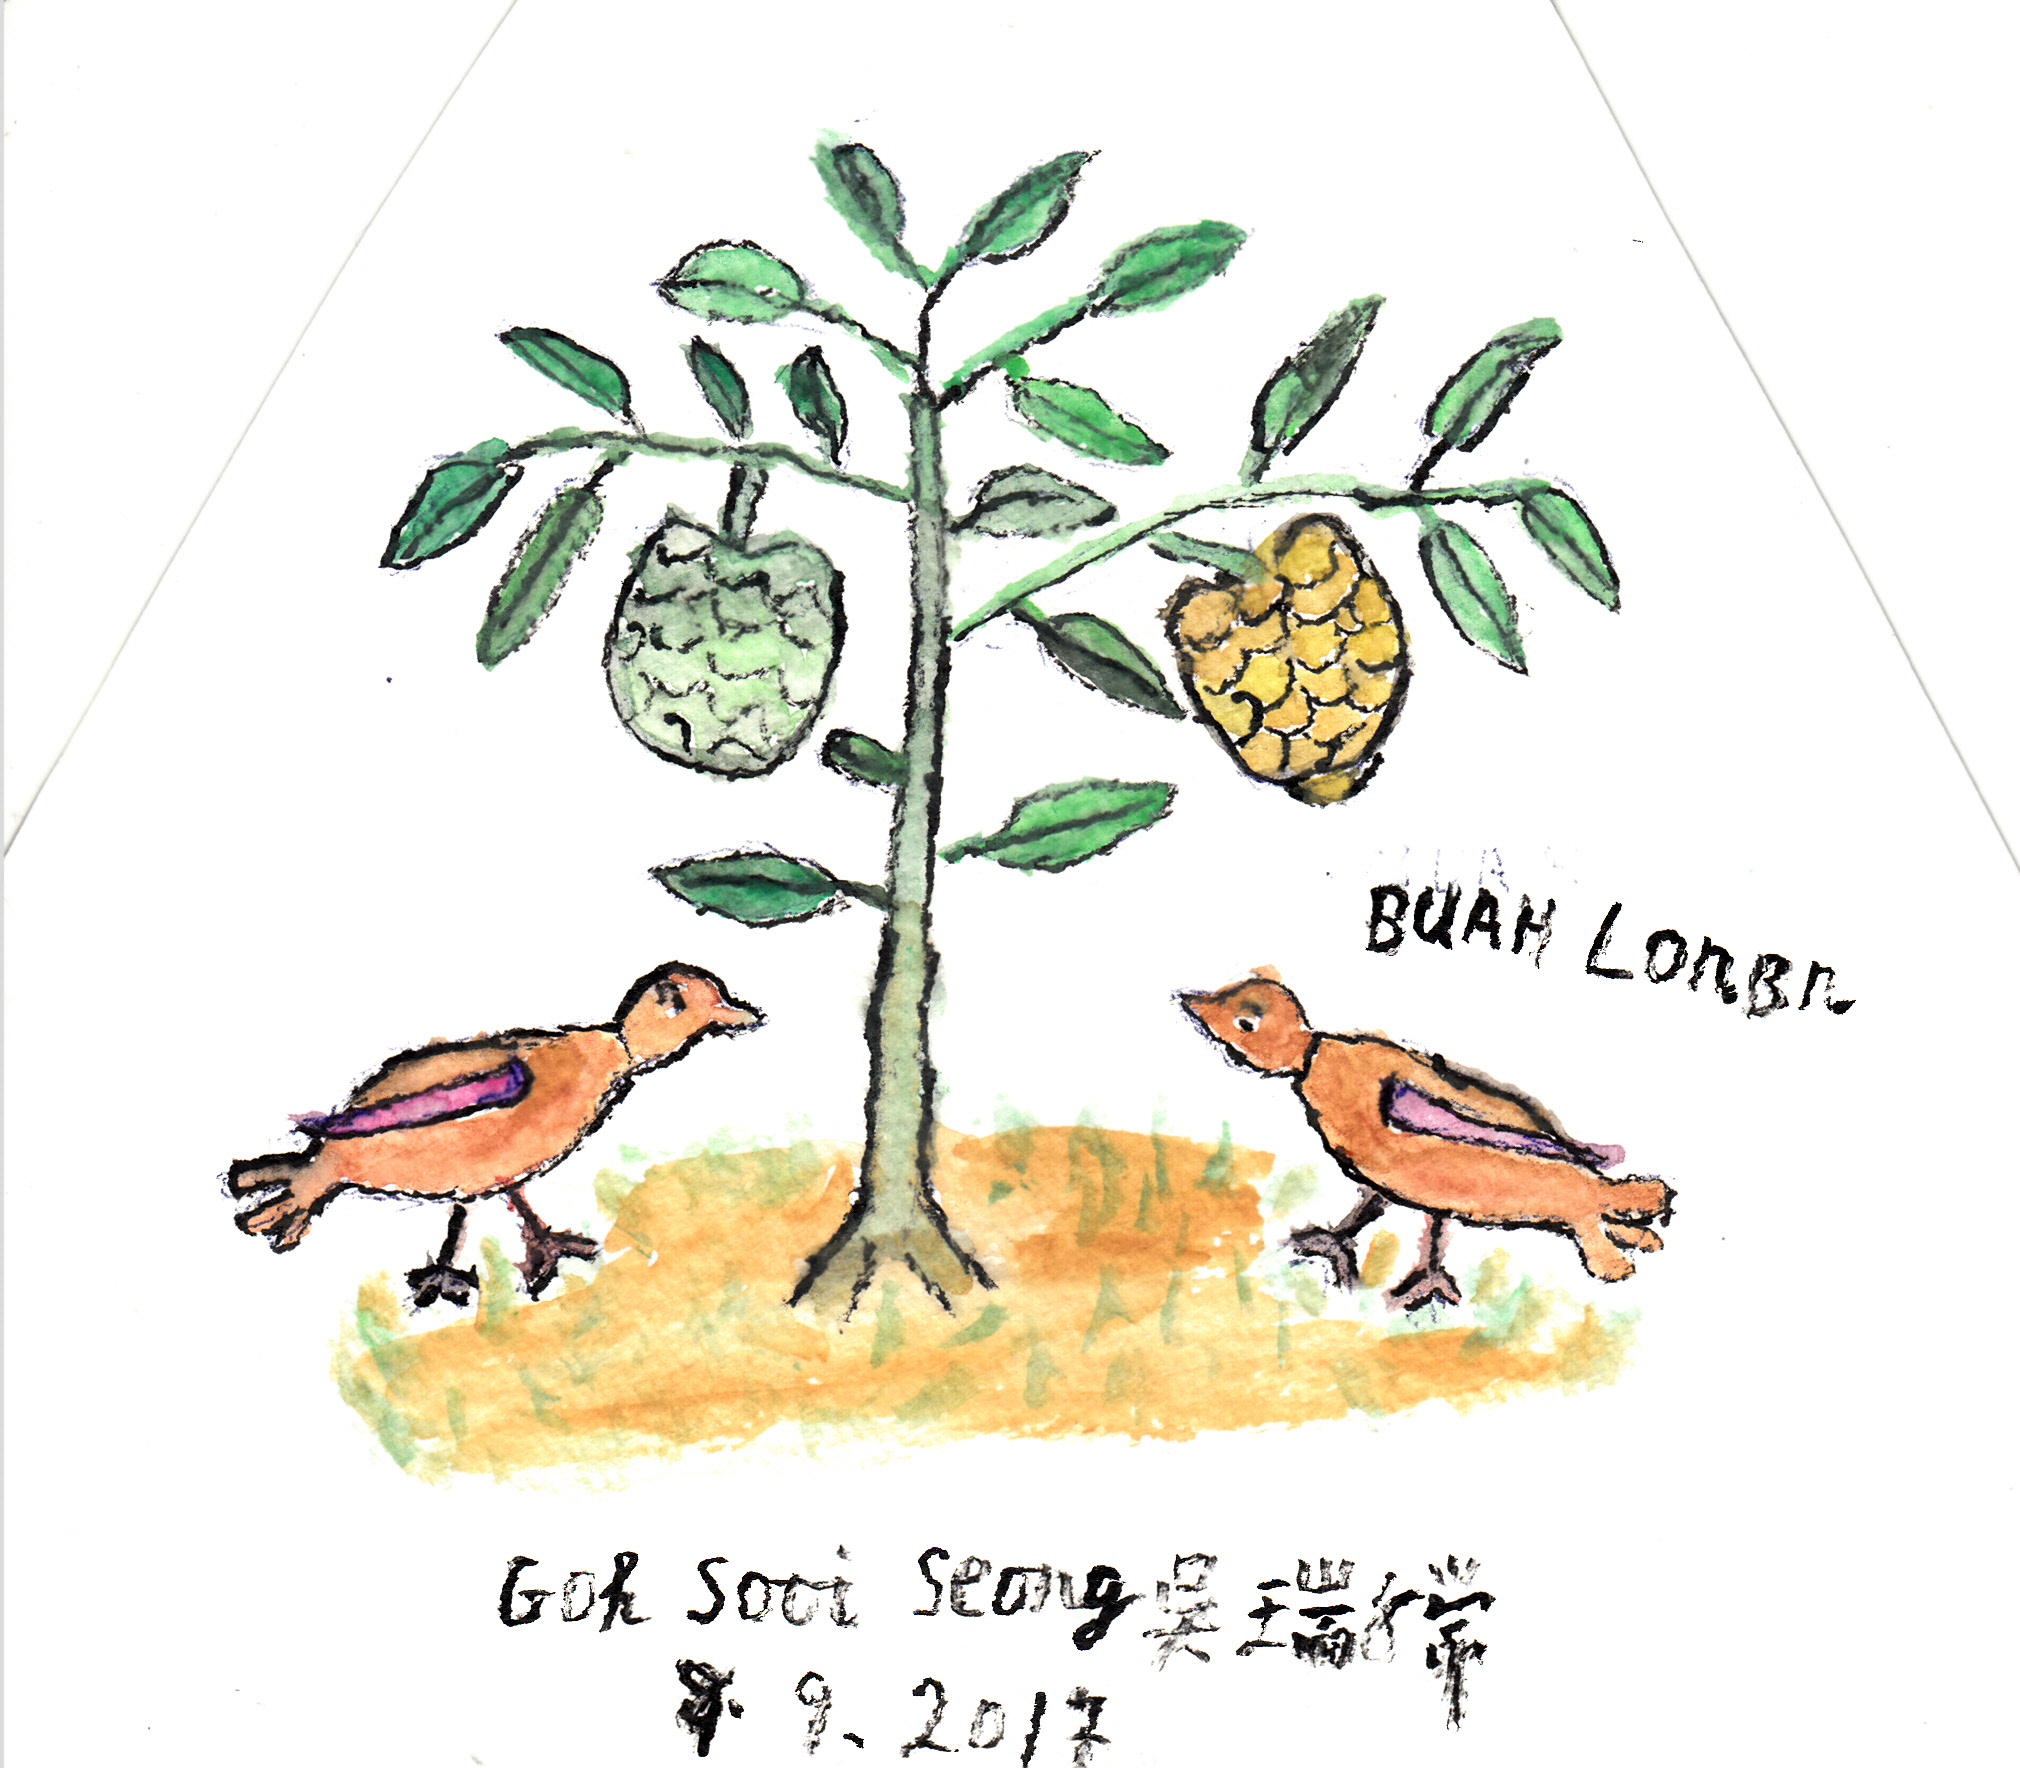 Goh Sooi Seong 21.jpg